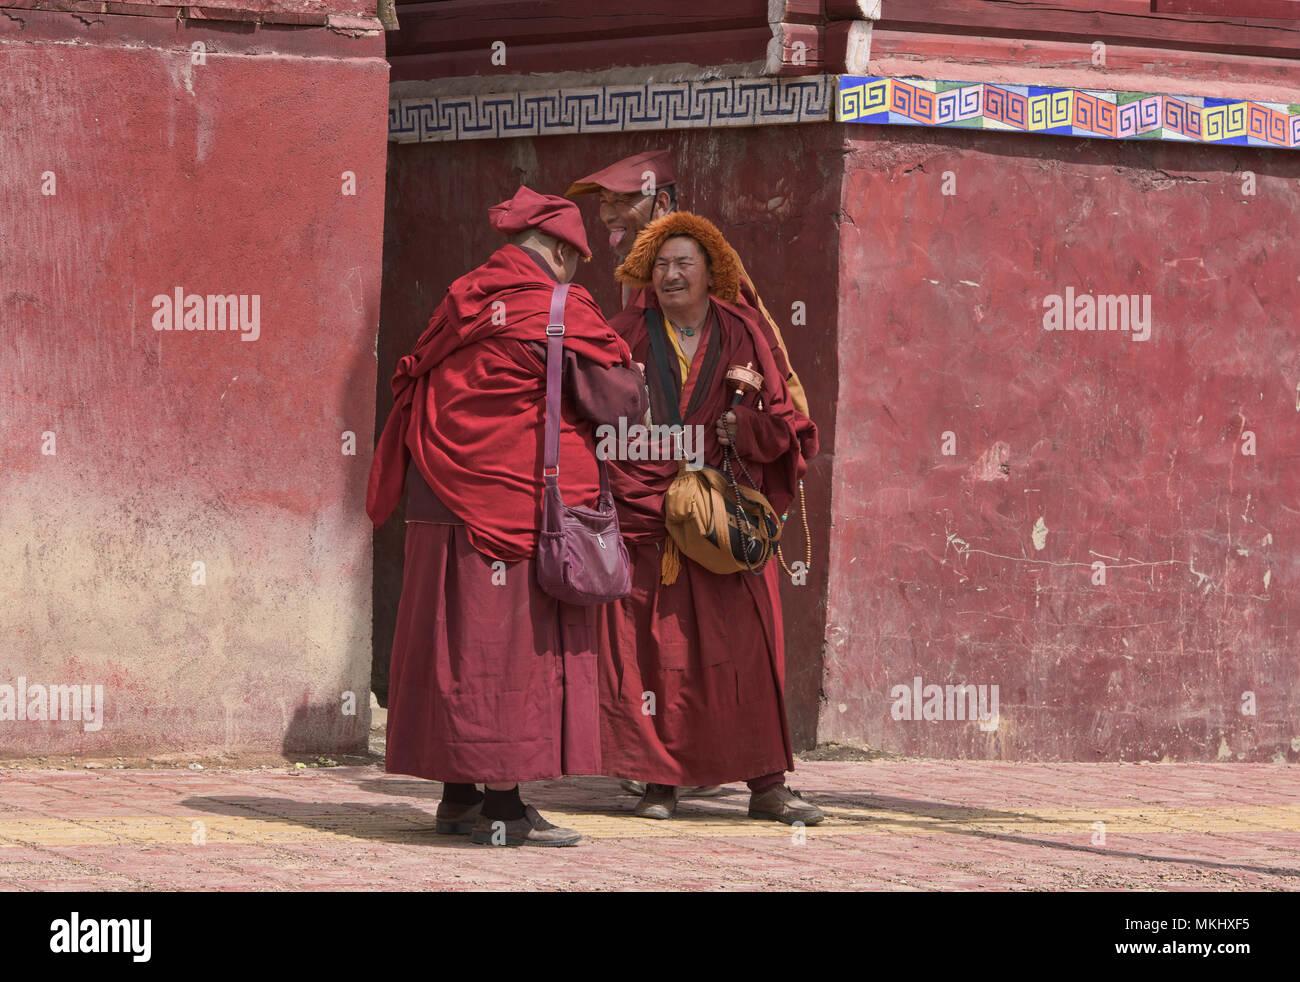 Monaci Tibetani socializzare, Yarchen Gar, Sichuan, in Cina Immagini Stock